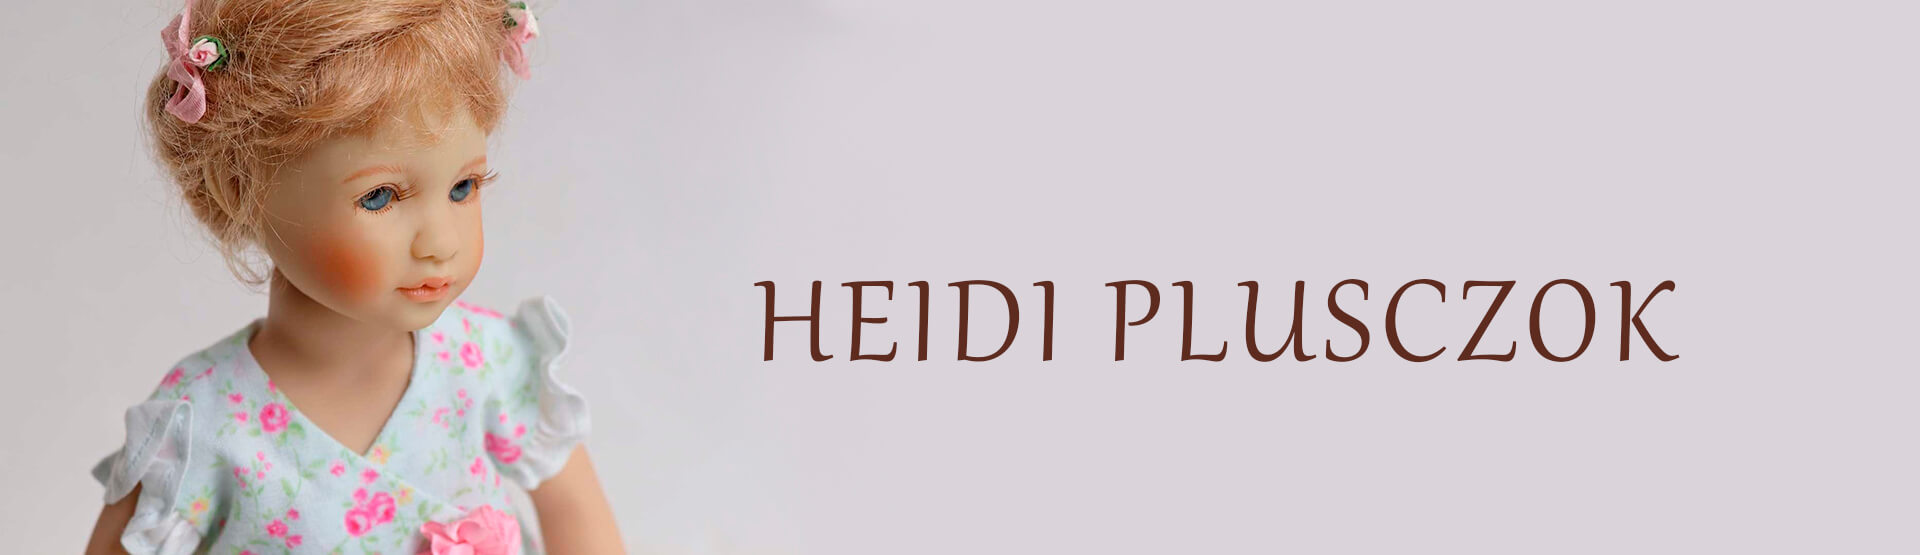 Heidi Plusczok